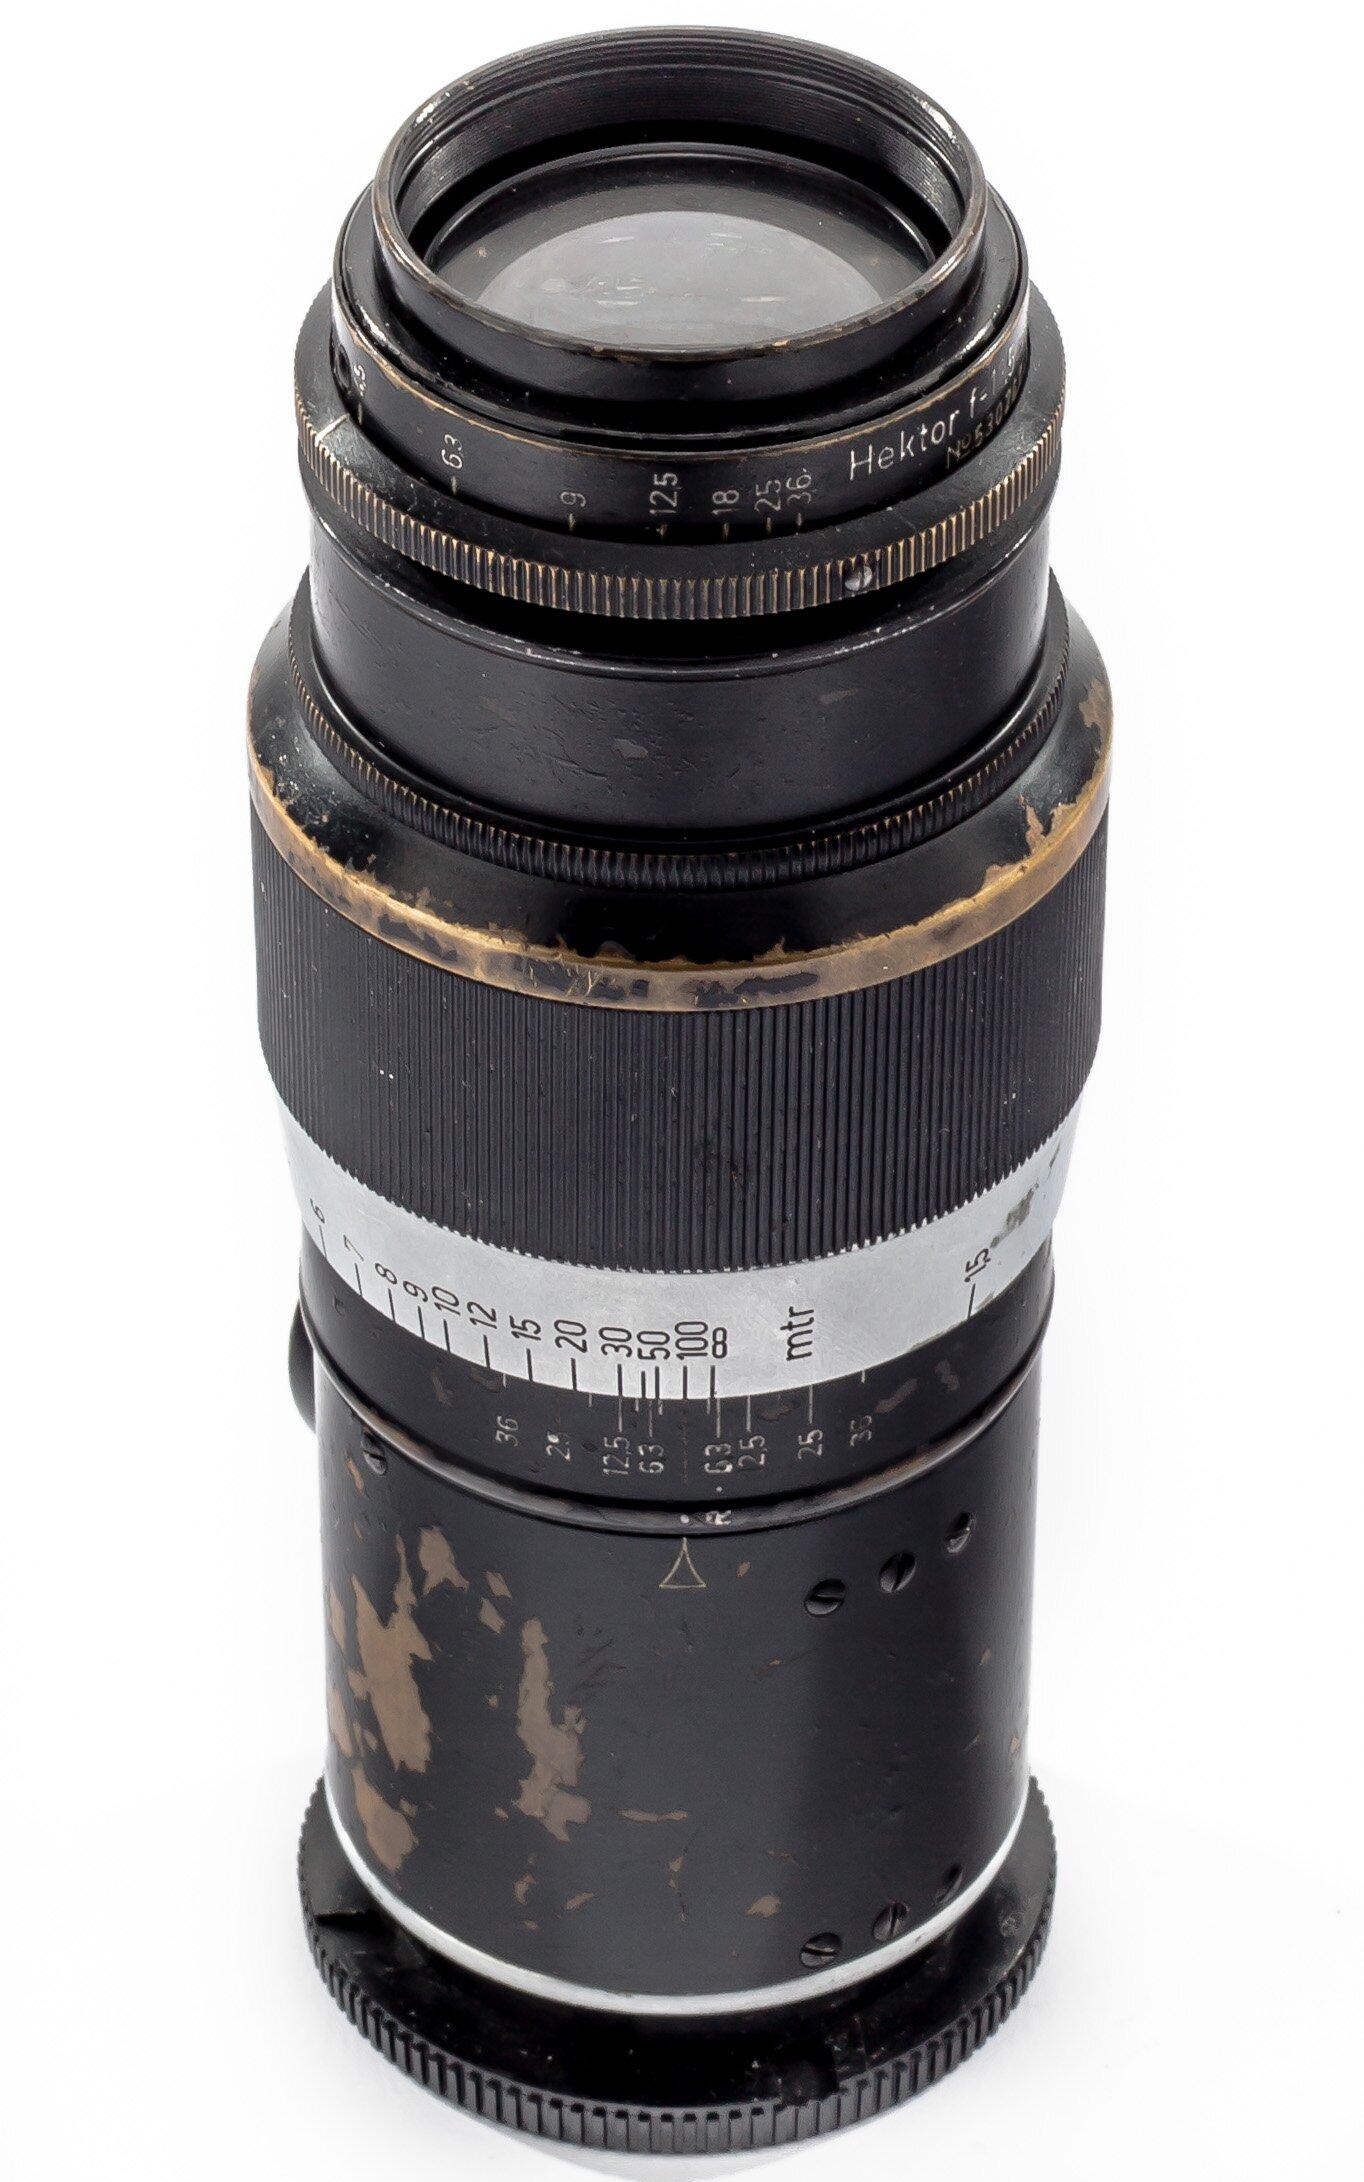 Leitz Leica M39 Hektor 13,5cm F4.5